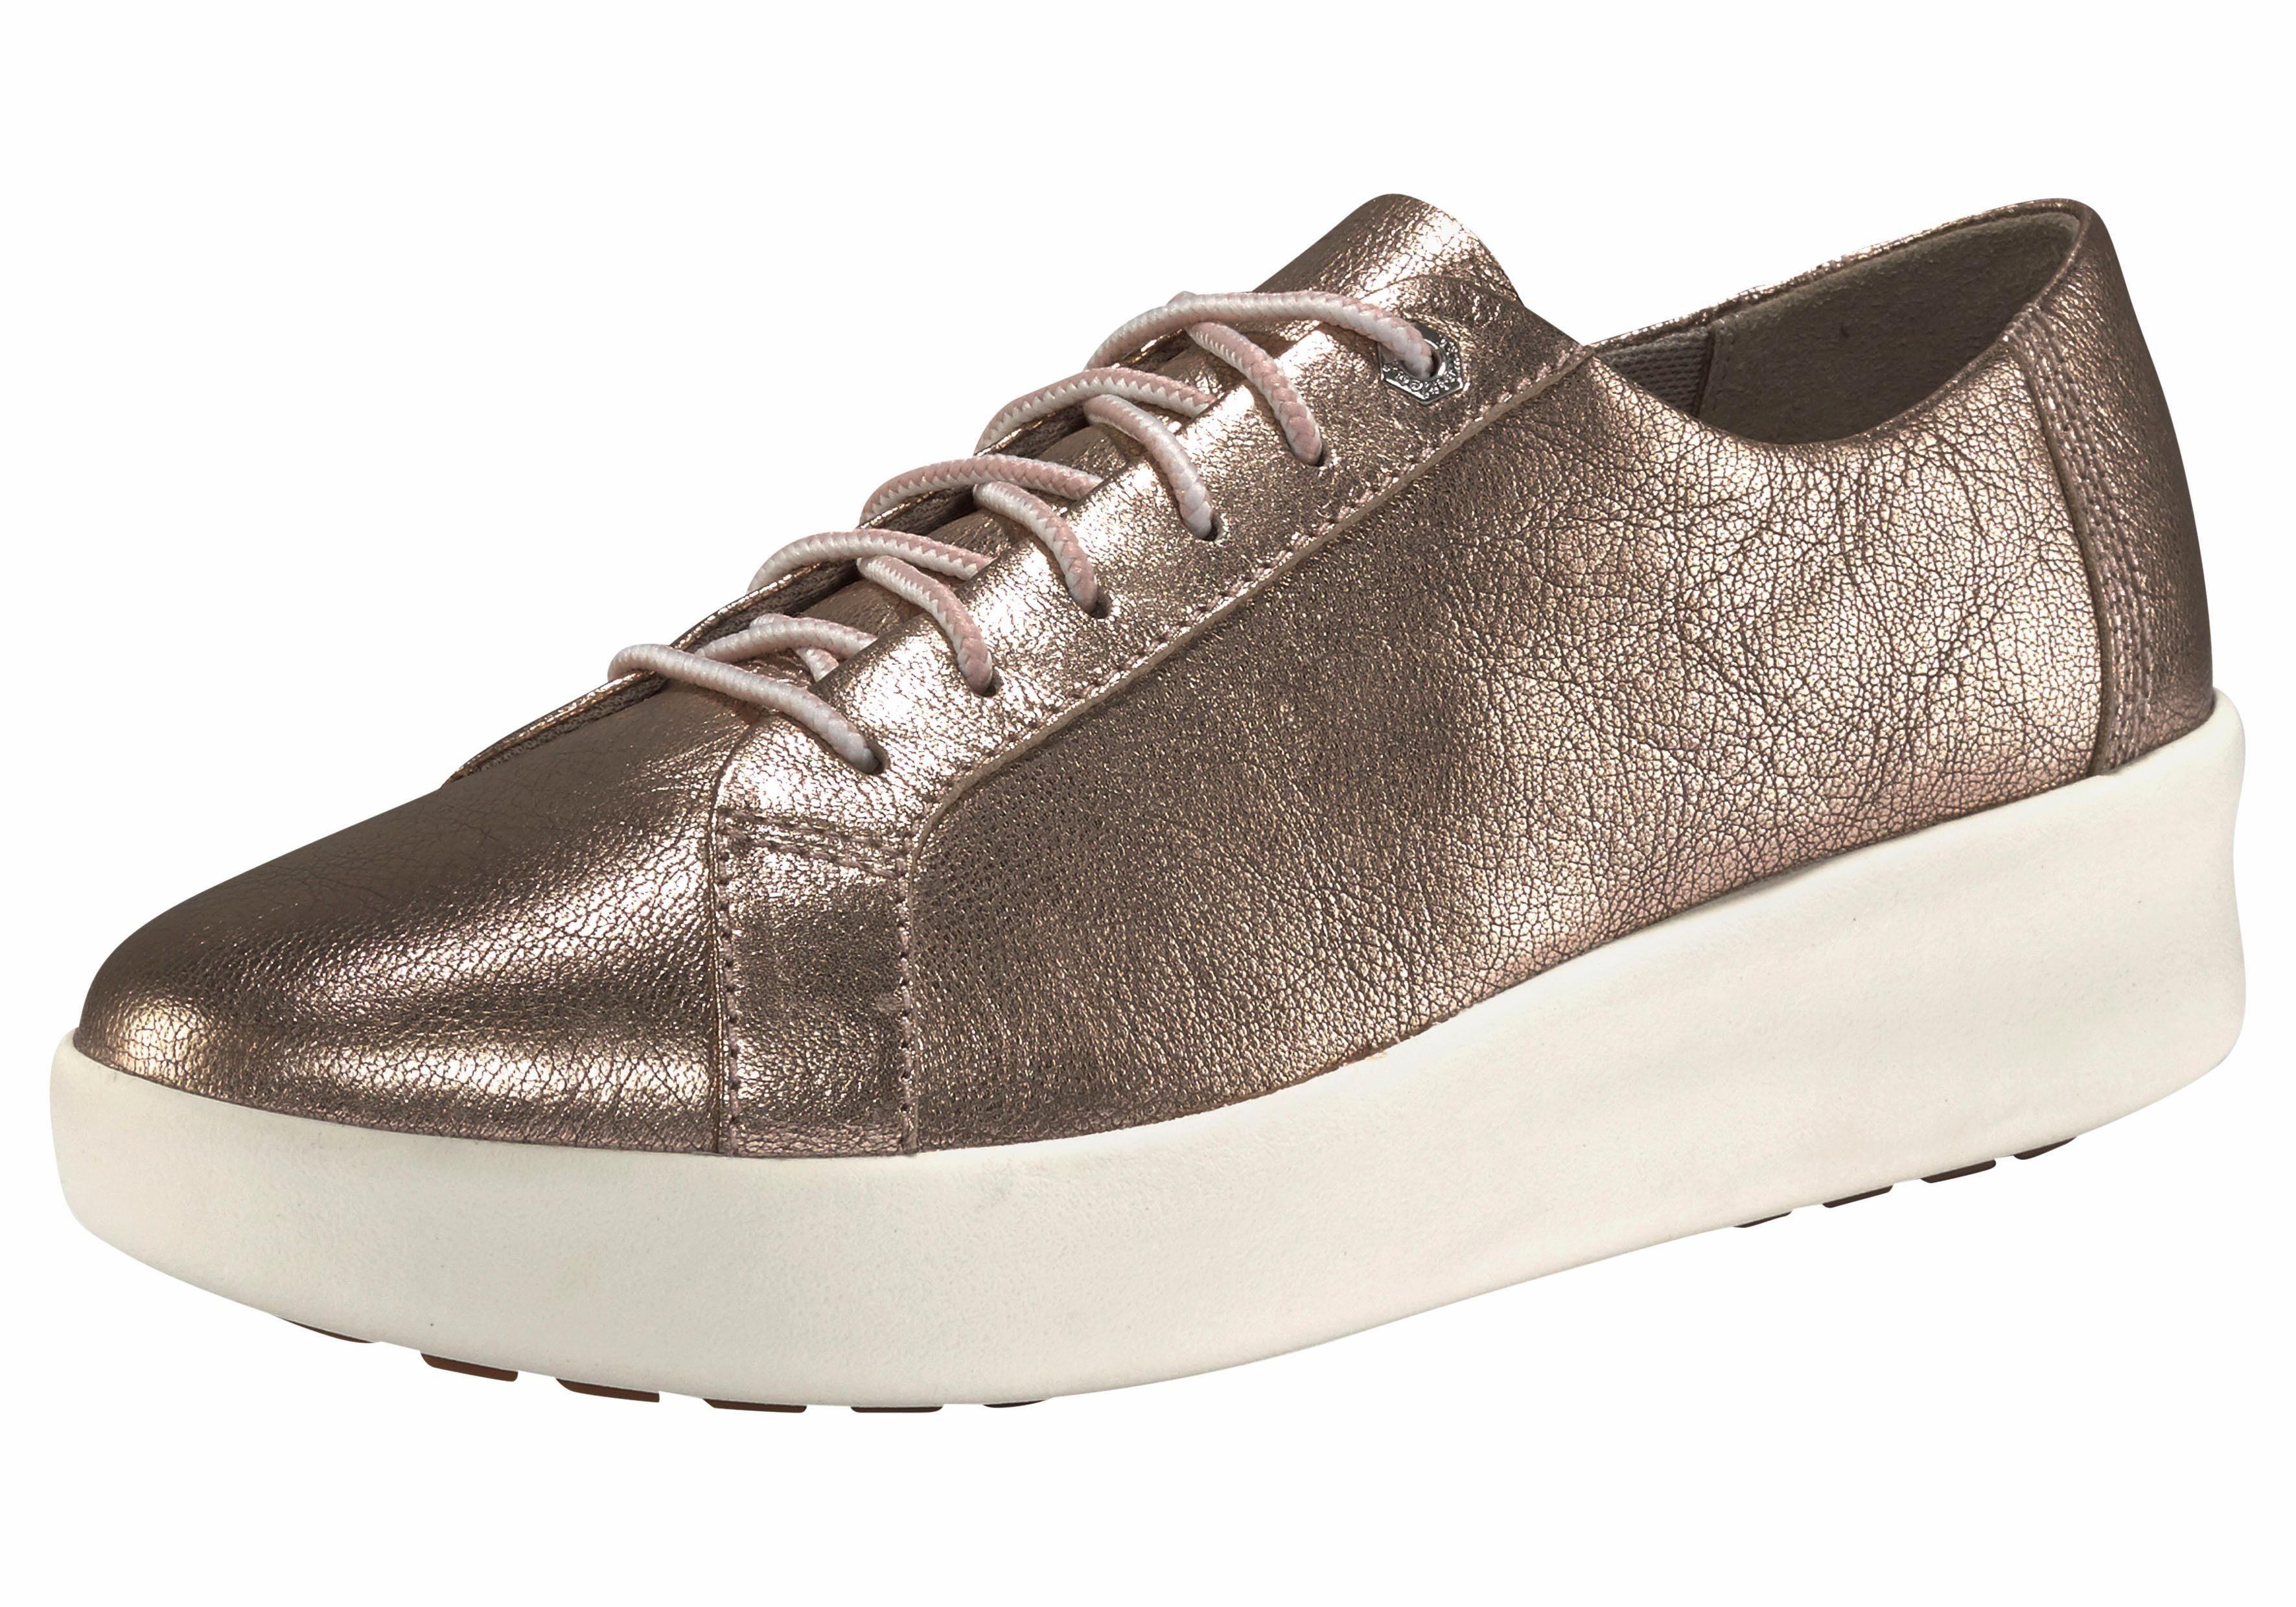 Pepe Jeans »ABERLADY DAISY« Sneaker, mit sommerlichem Lasercut, goldfarben, roségoldfarben